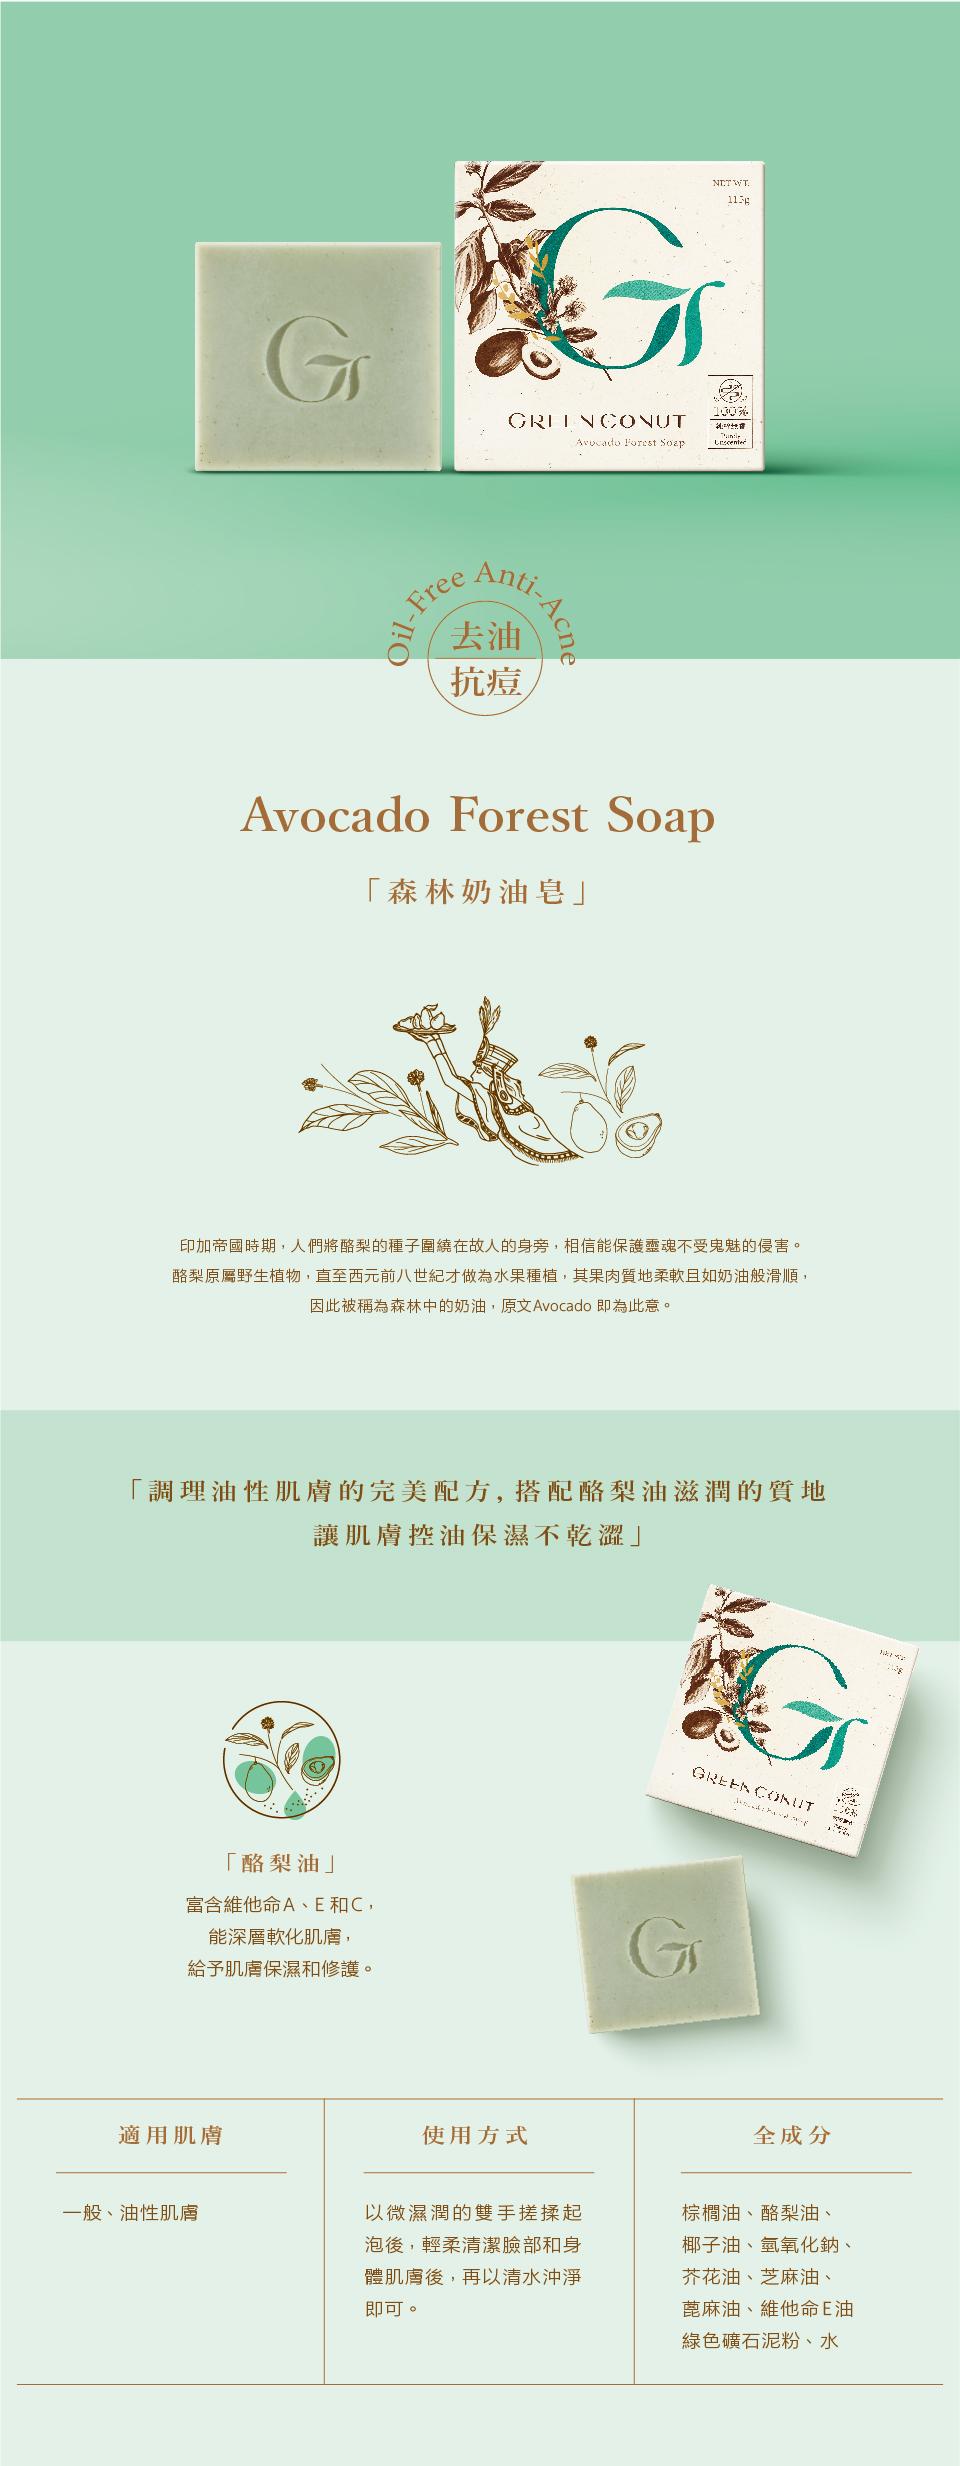 GREEN CONUT 綠果, 綠果手工皂, 黑木死海泥皂, 手摘紅寶石皂, 森林奶油皂, 手工皂推薦, 肥皂推薦, 綠果皂, 綠果哪裡買, 手工皂哪裡買, 綠果手工皂門市, 試用, 體驗